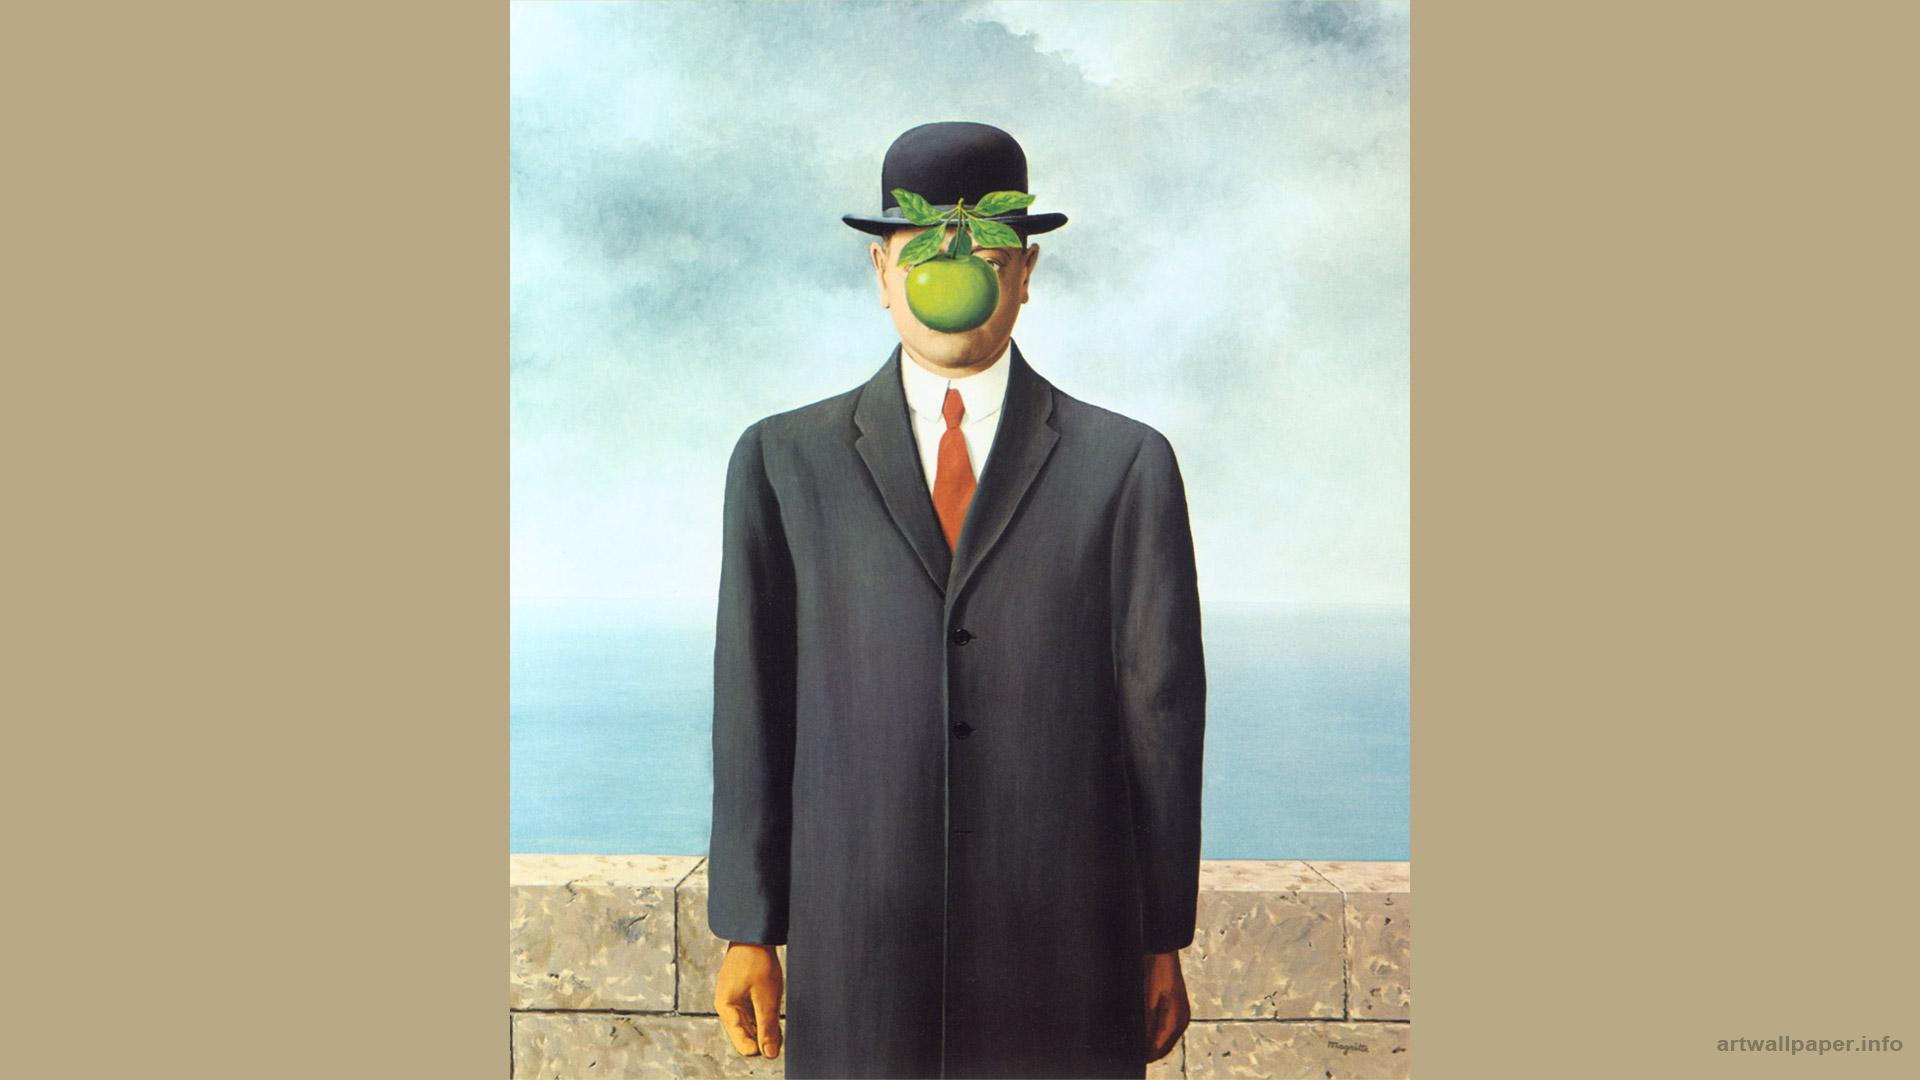 Rene Magritte Wallpaper 01 1920x1080